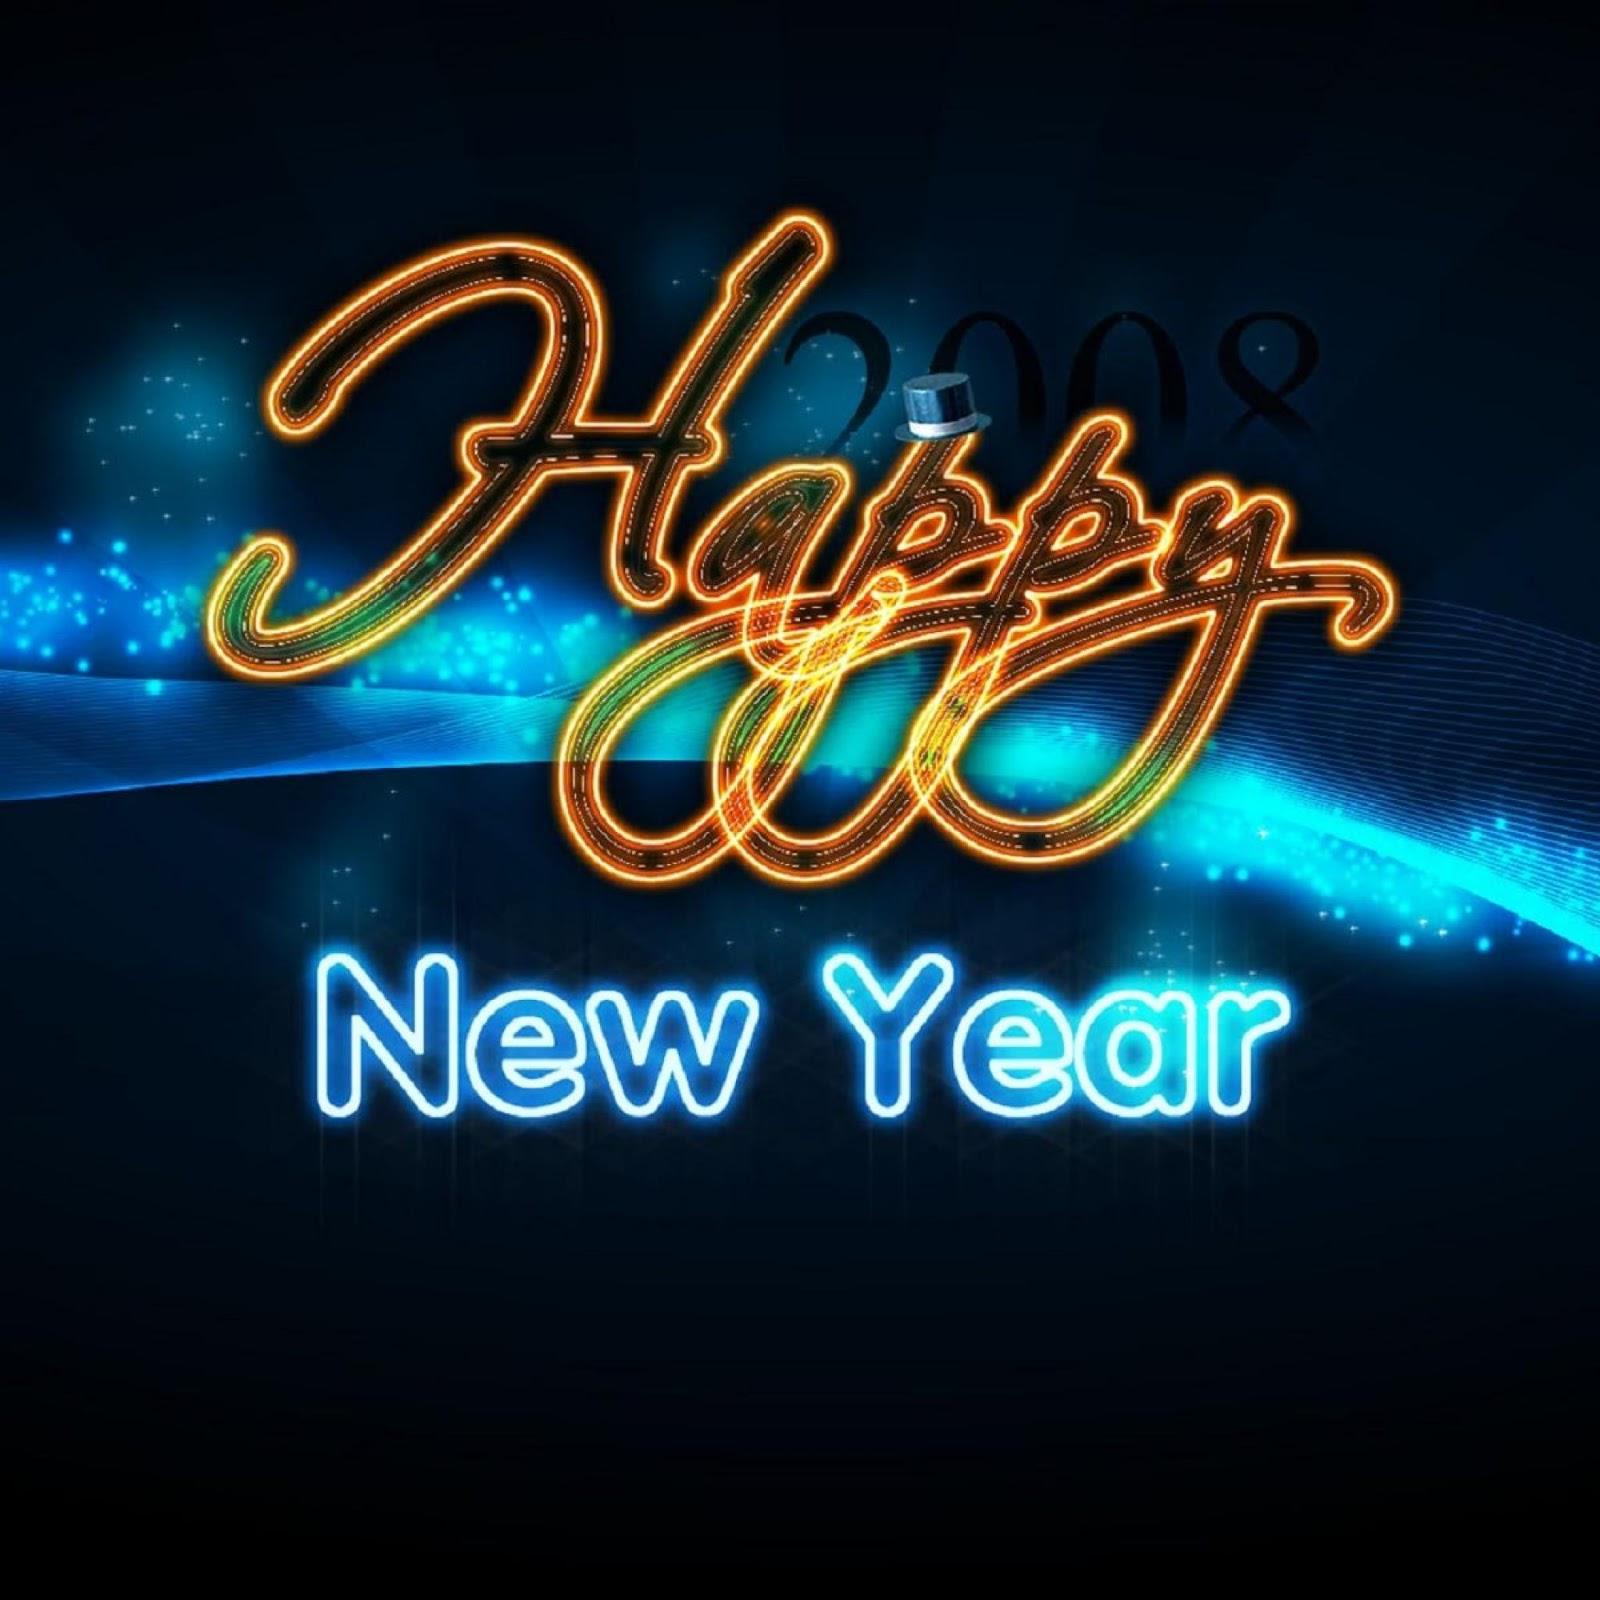 free new year 2013 ipad wallpaper 06